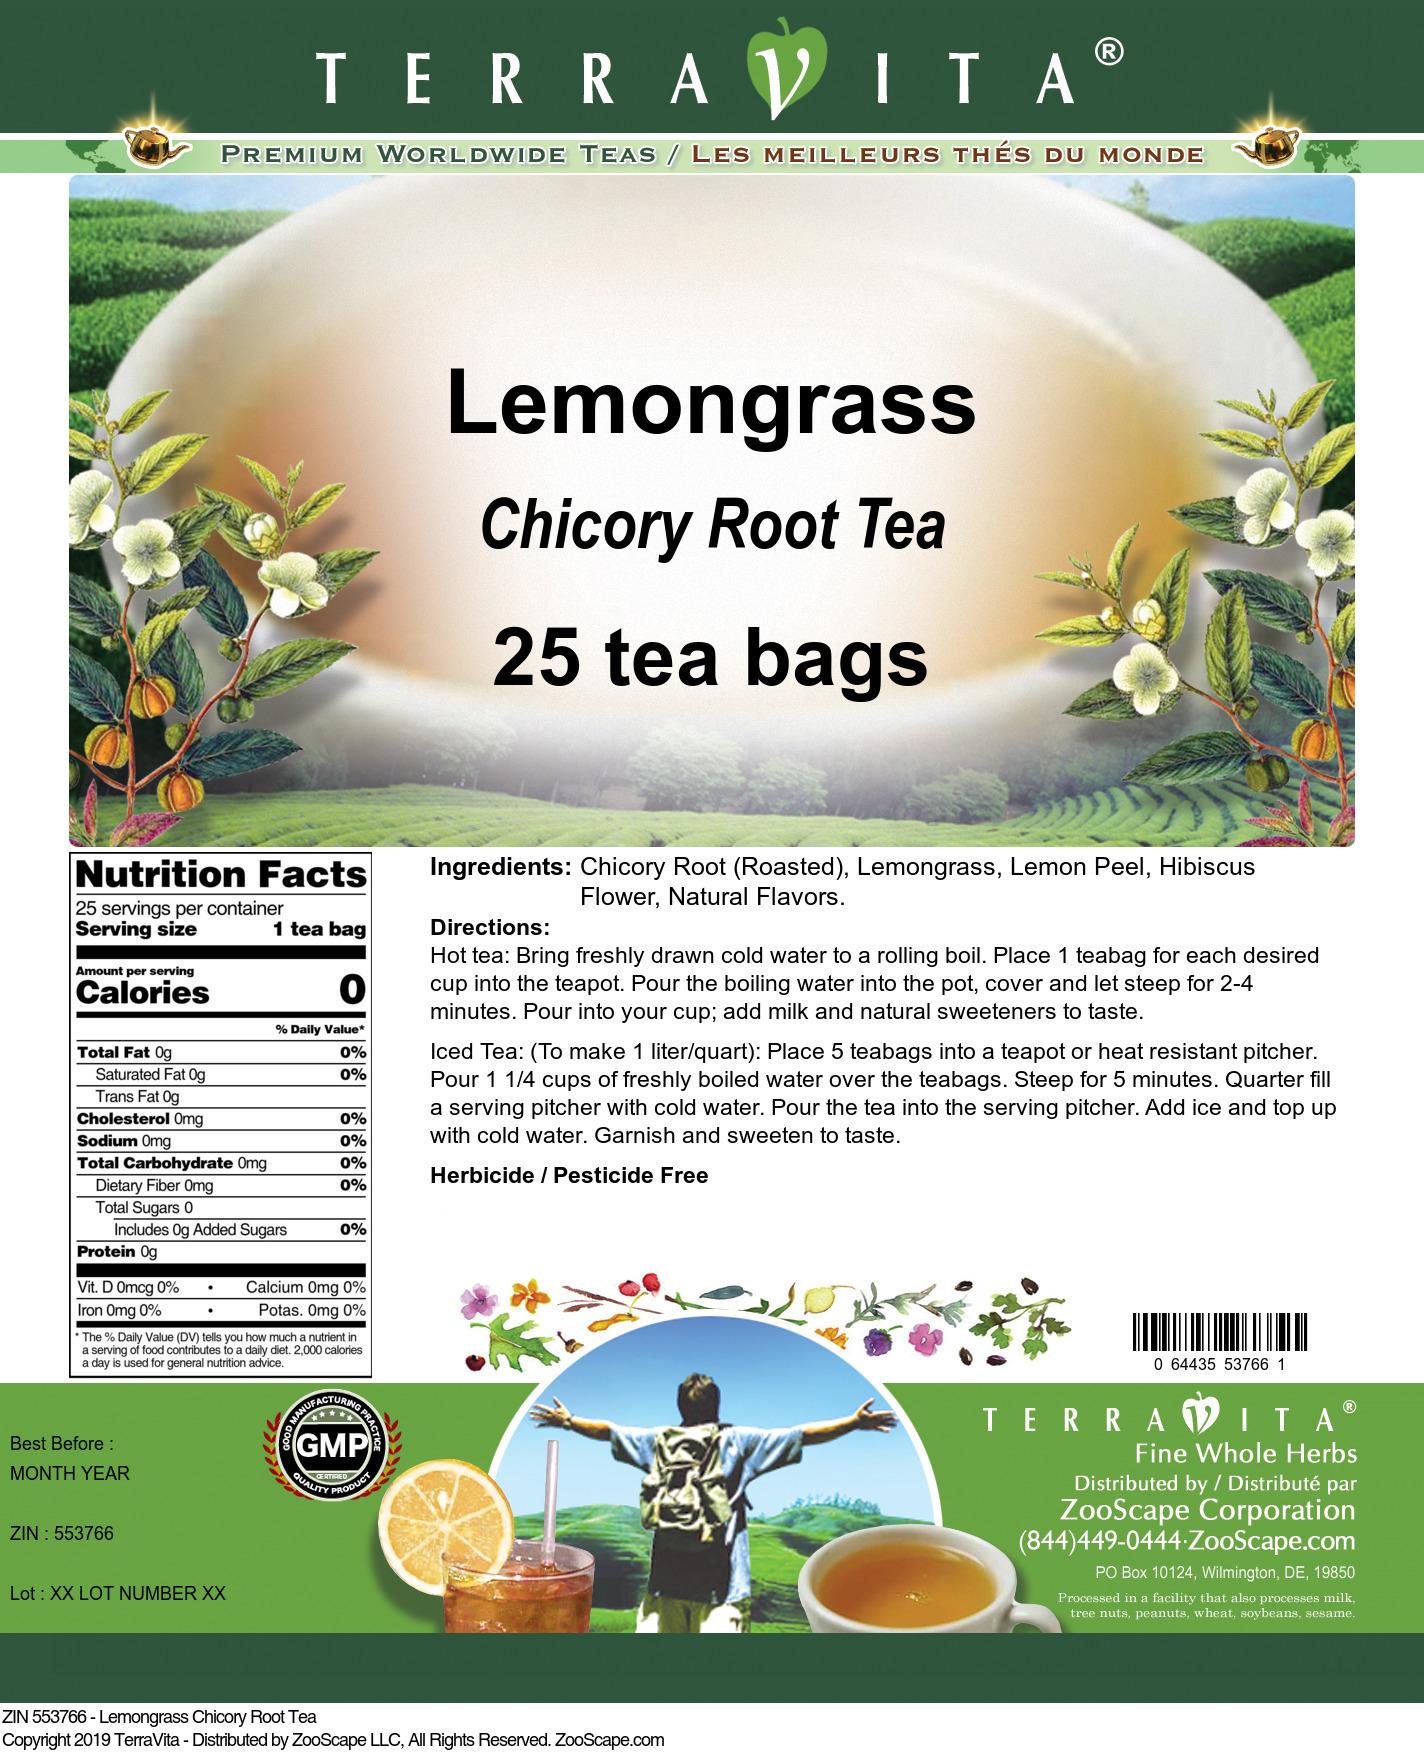 Lemongrass Chicory Root Tea